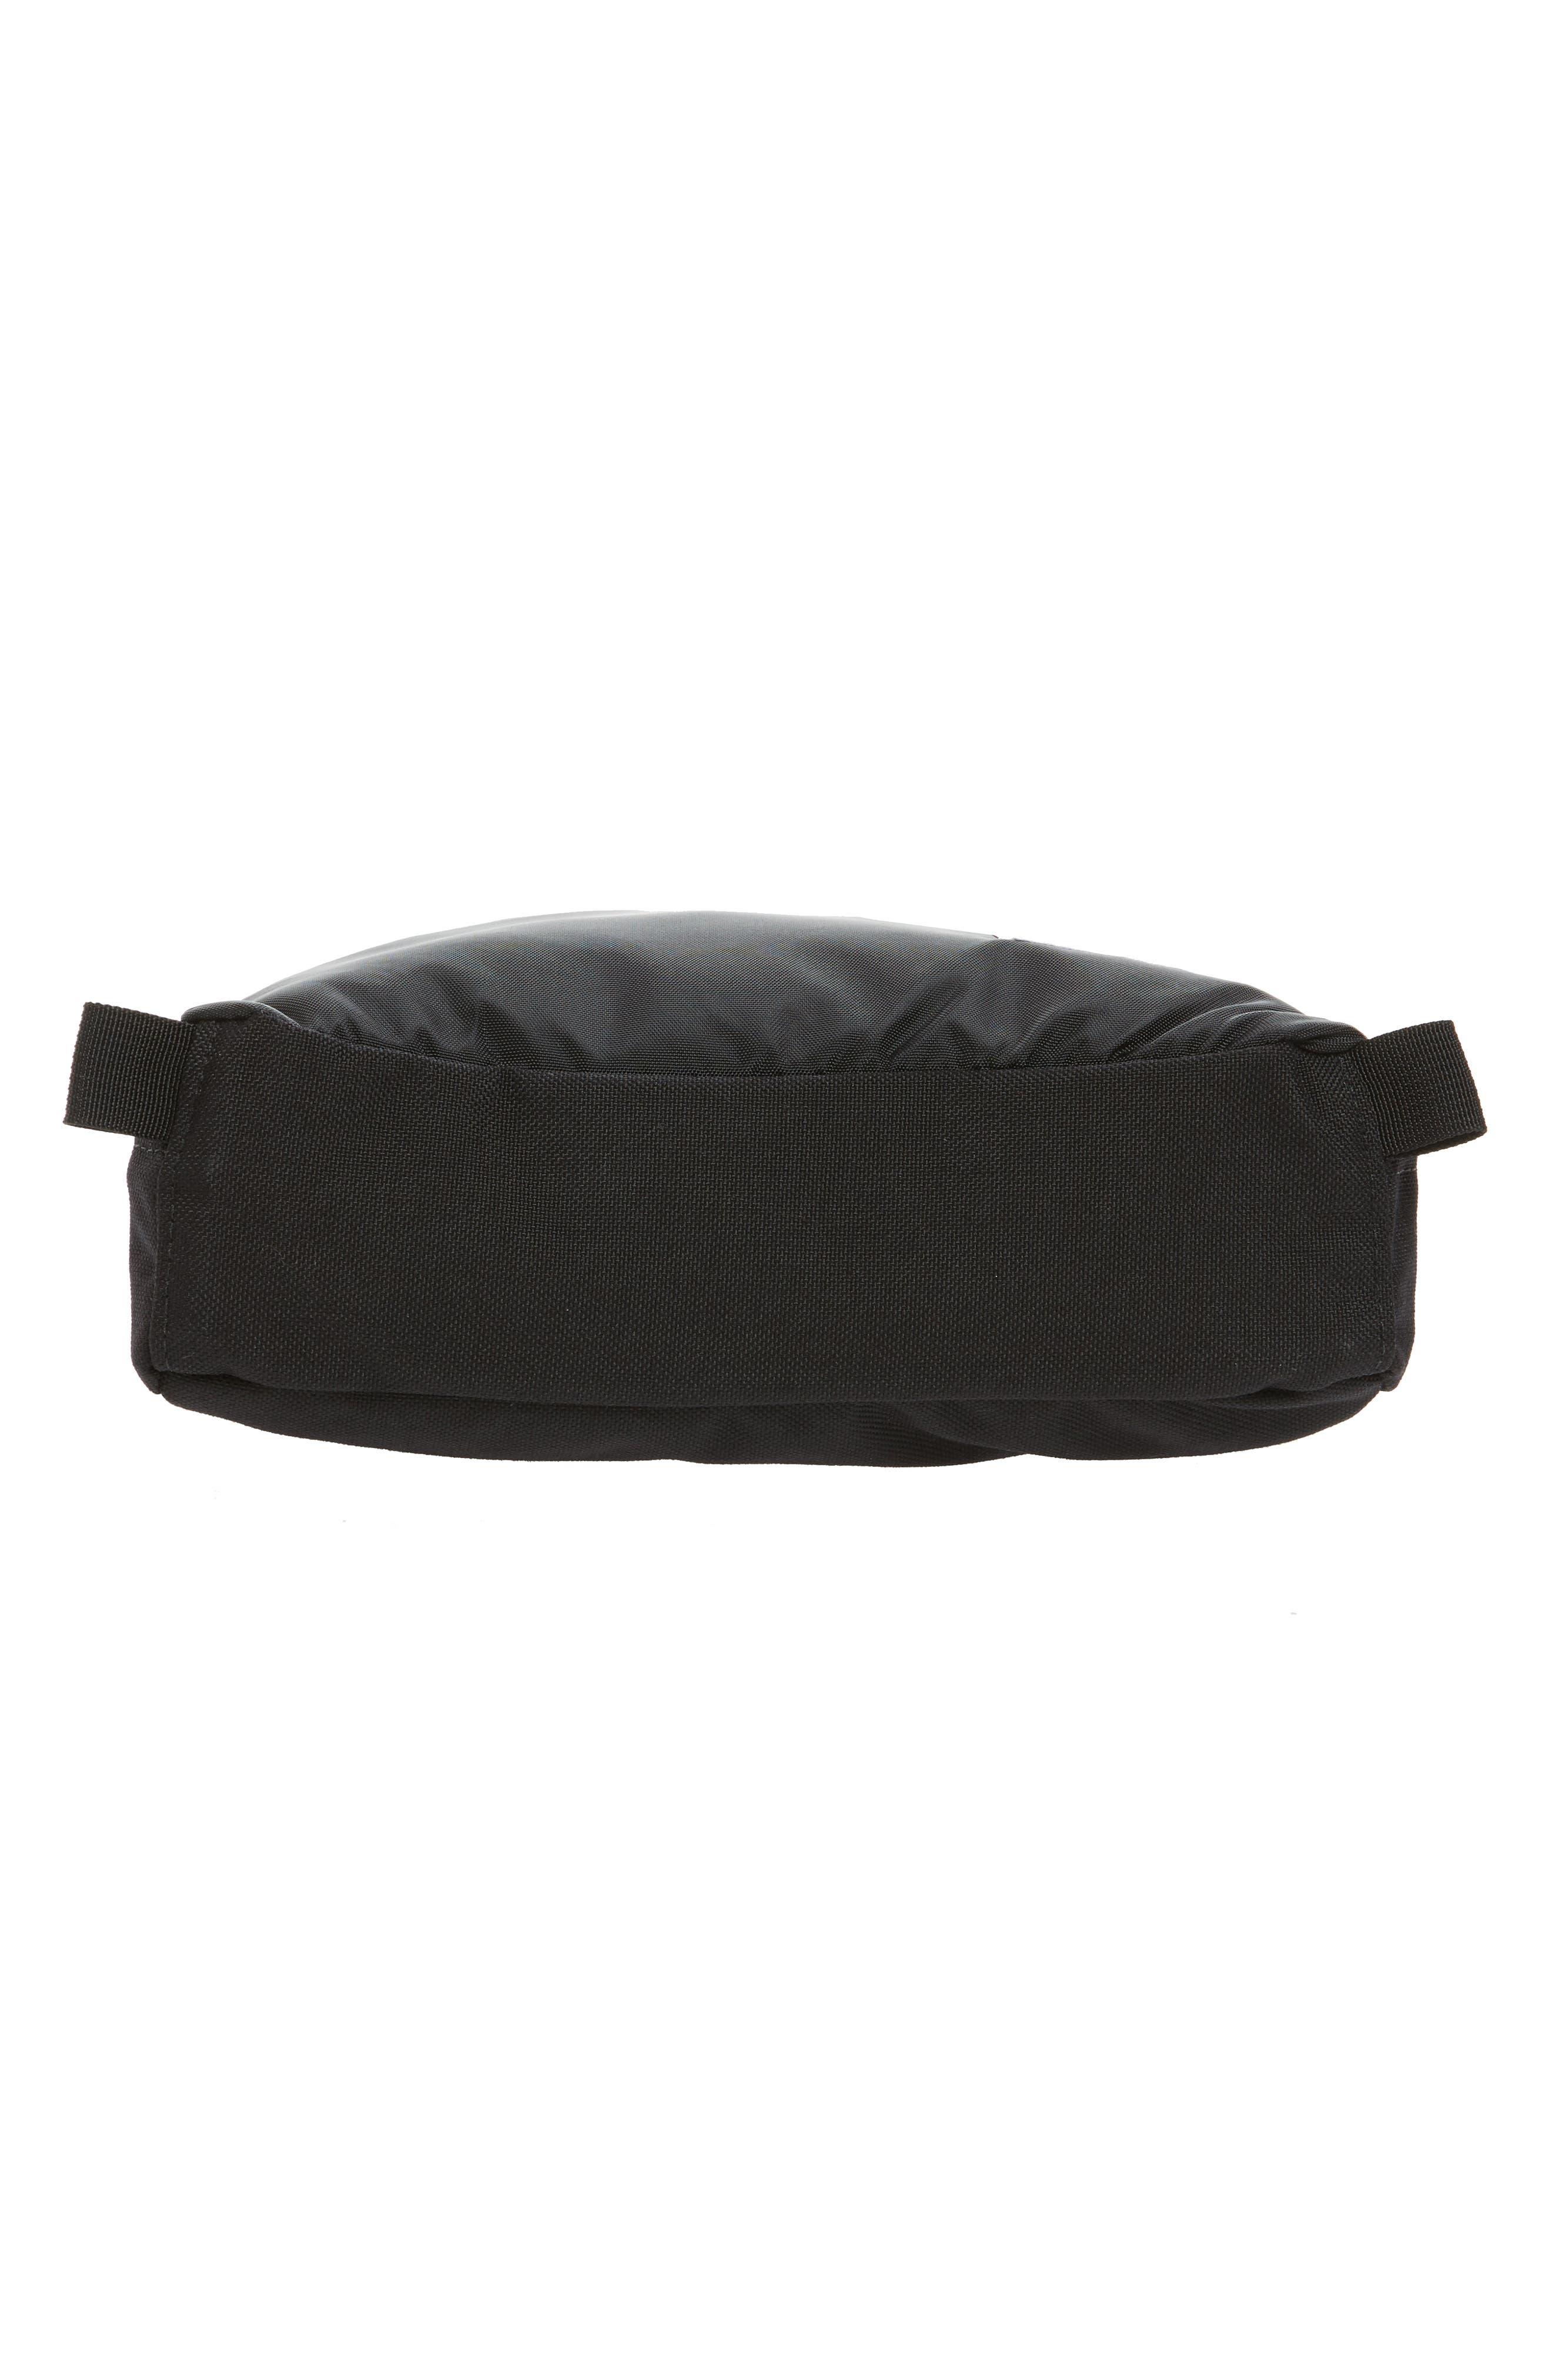 Alternate Image 5  - Topo Designs Pack Bags Tote